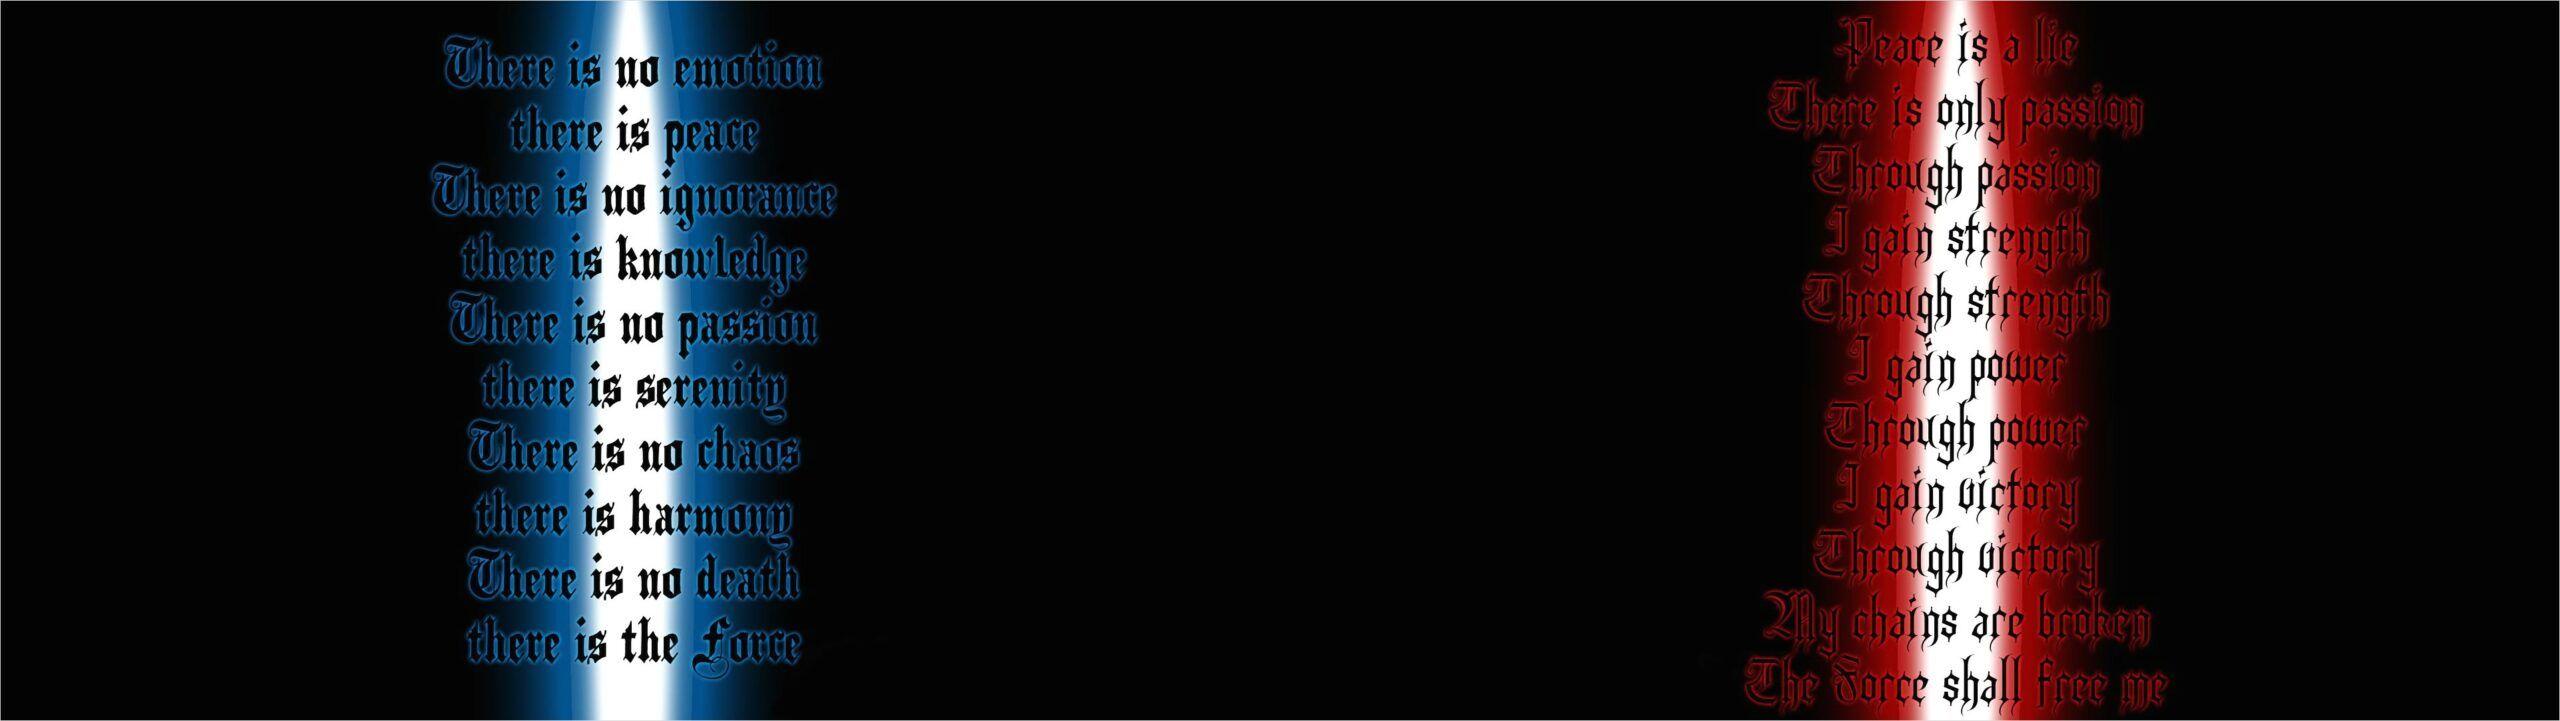 Sith Code 2560x721 Download Hd Wallpaper Wallpapertip